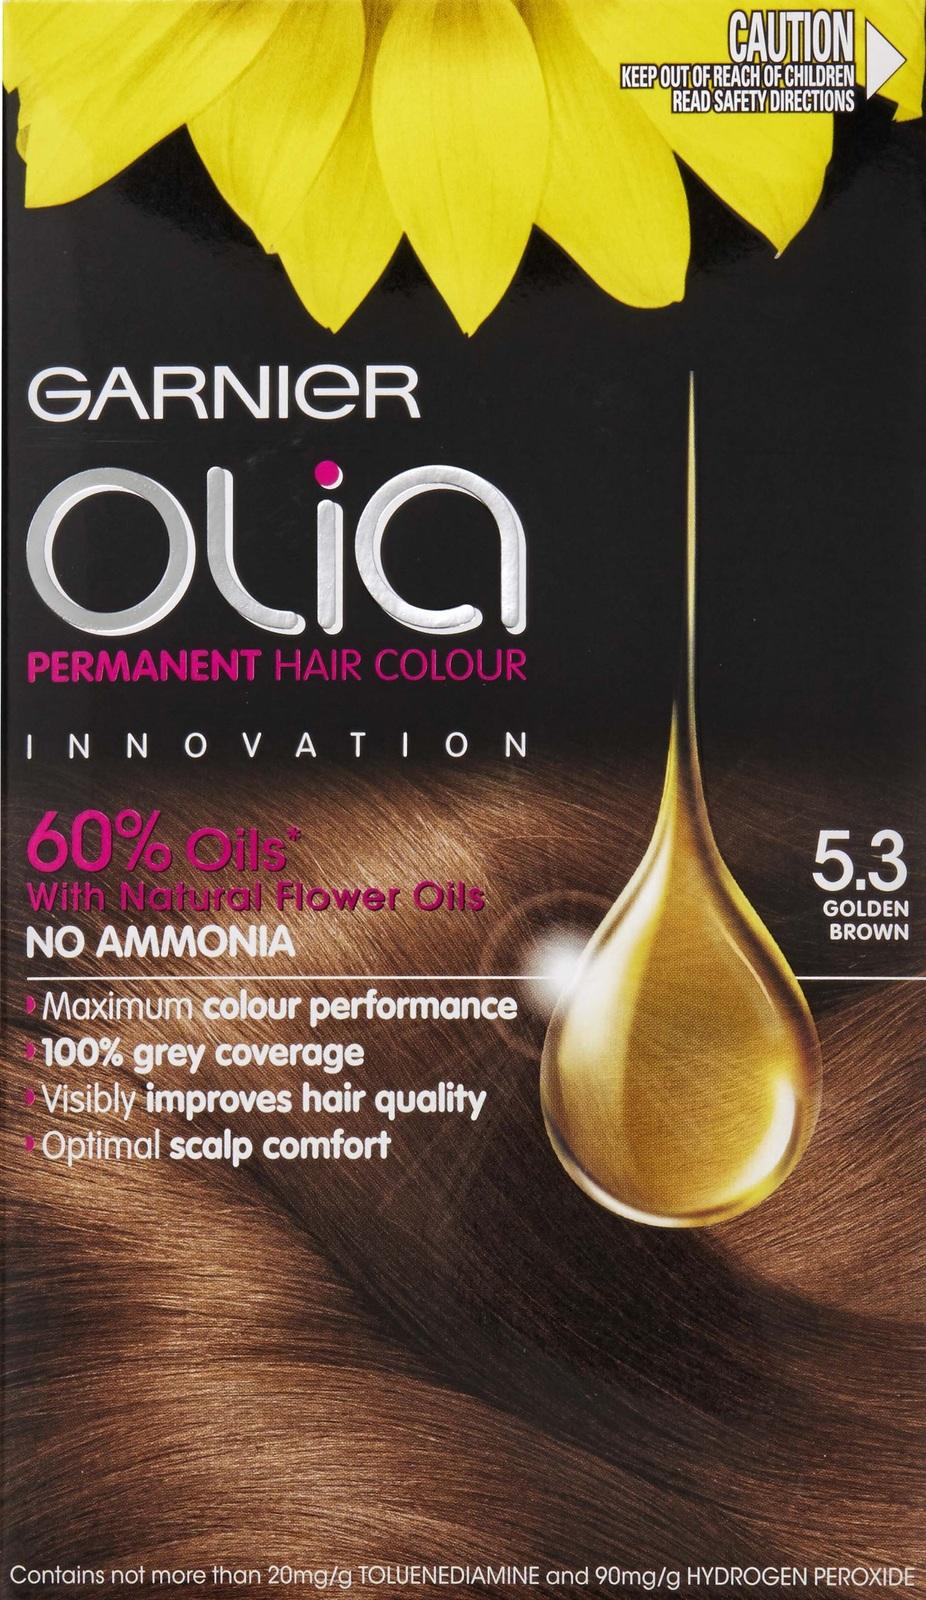 Garnier olia permanent hair colour golden brown 5 3 - Garnier Olia Permanent Hair Colour 5 3 Golden Brown Image